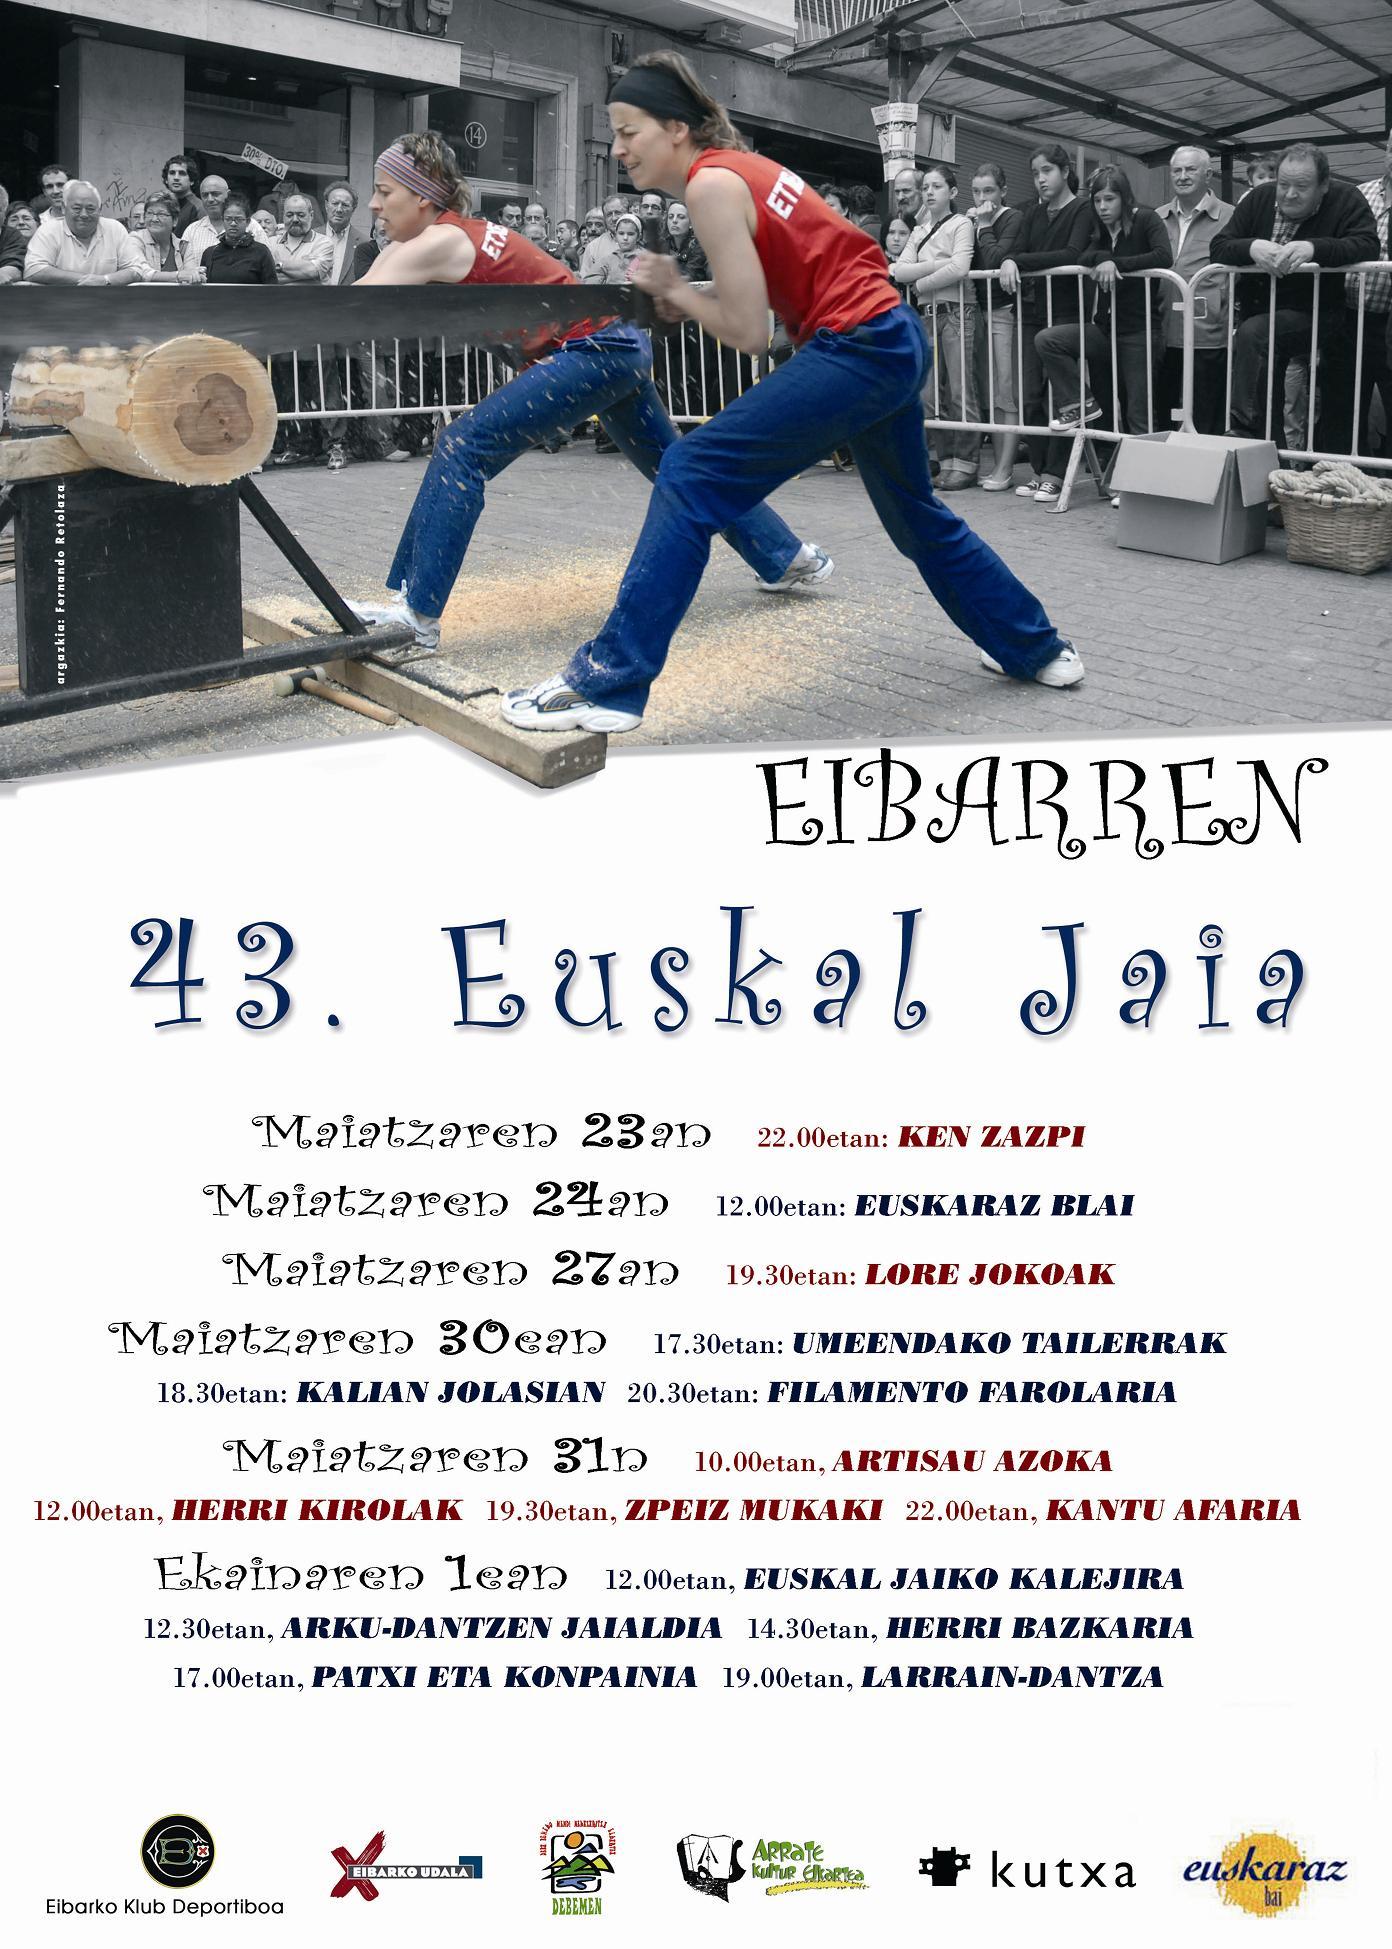 Euskal Jaiko kartela